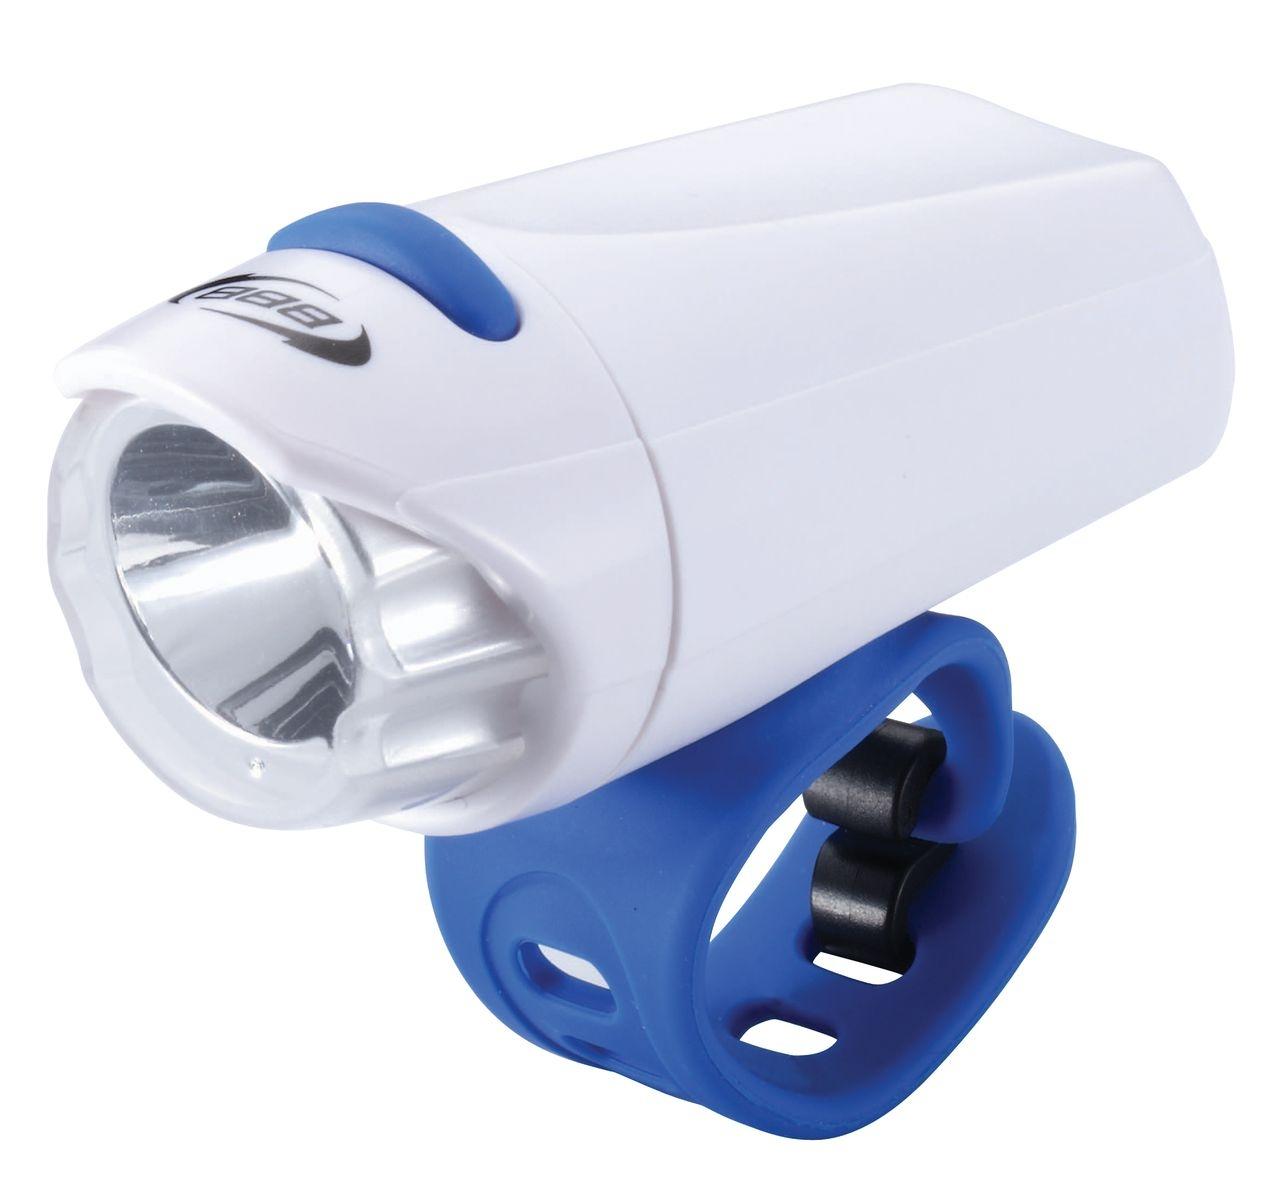 Éclairage AV BBB EcoBeam (blanc/bleu) - BLS-75